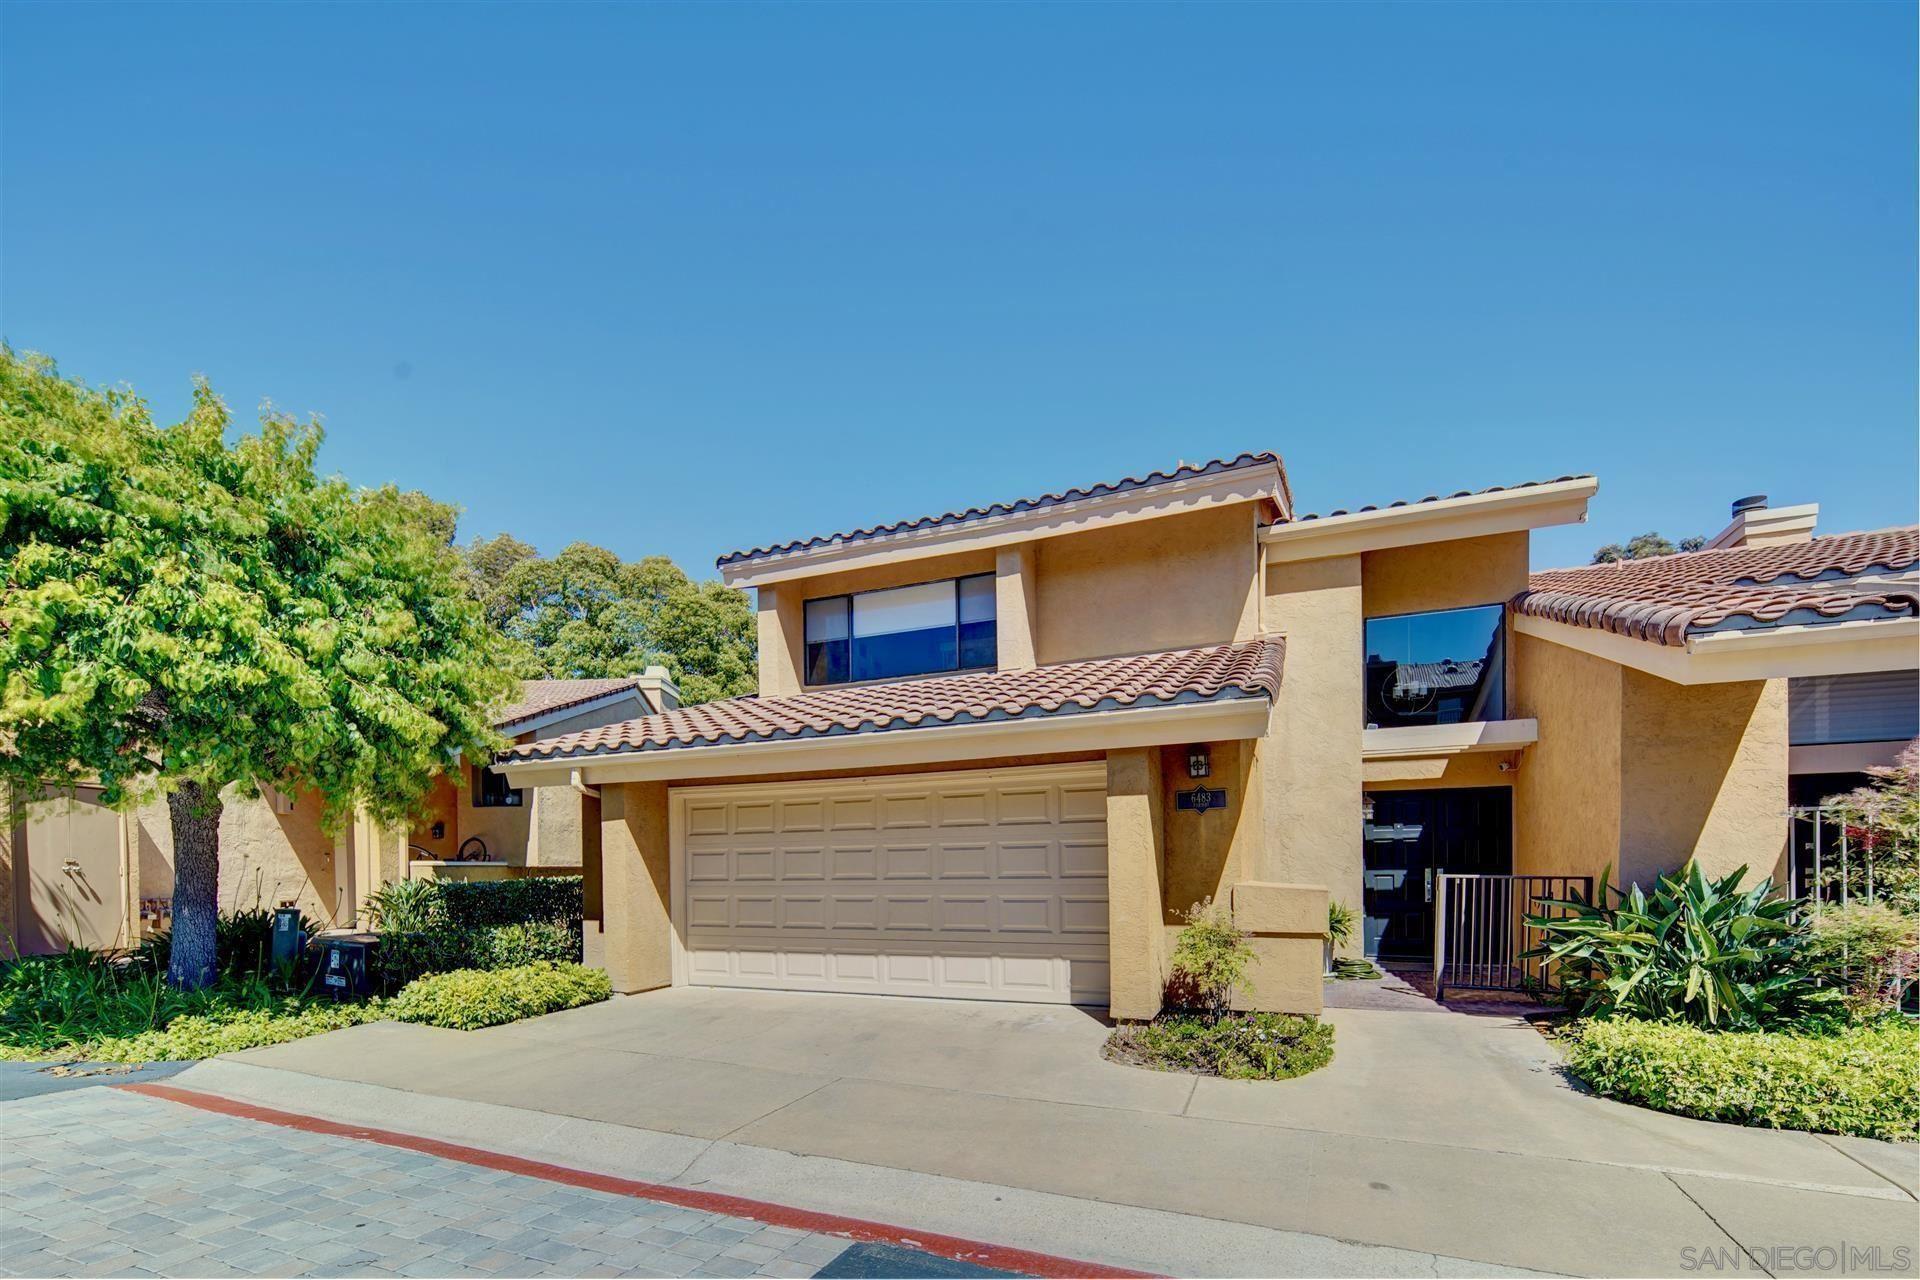 Photo of 6483 Caminito Formby, La Jolla, CA 92037 (MLS # 210016330)